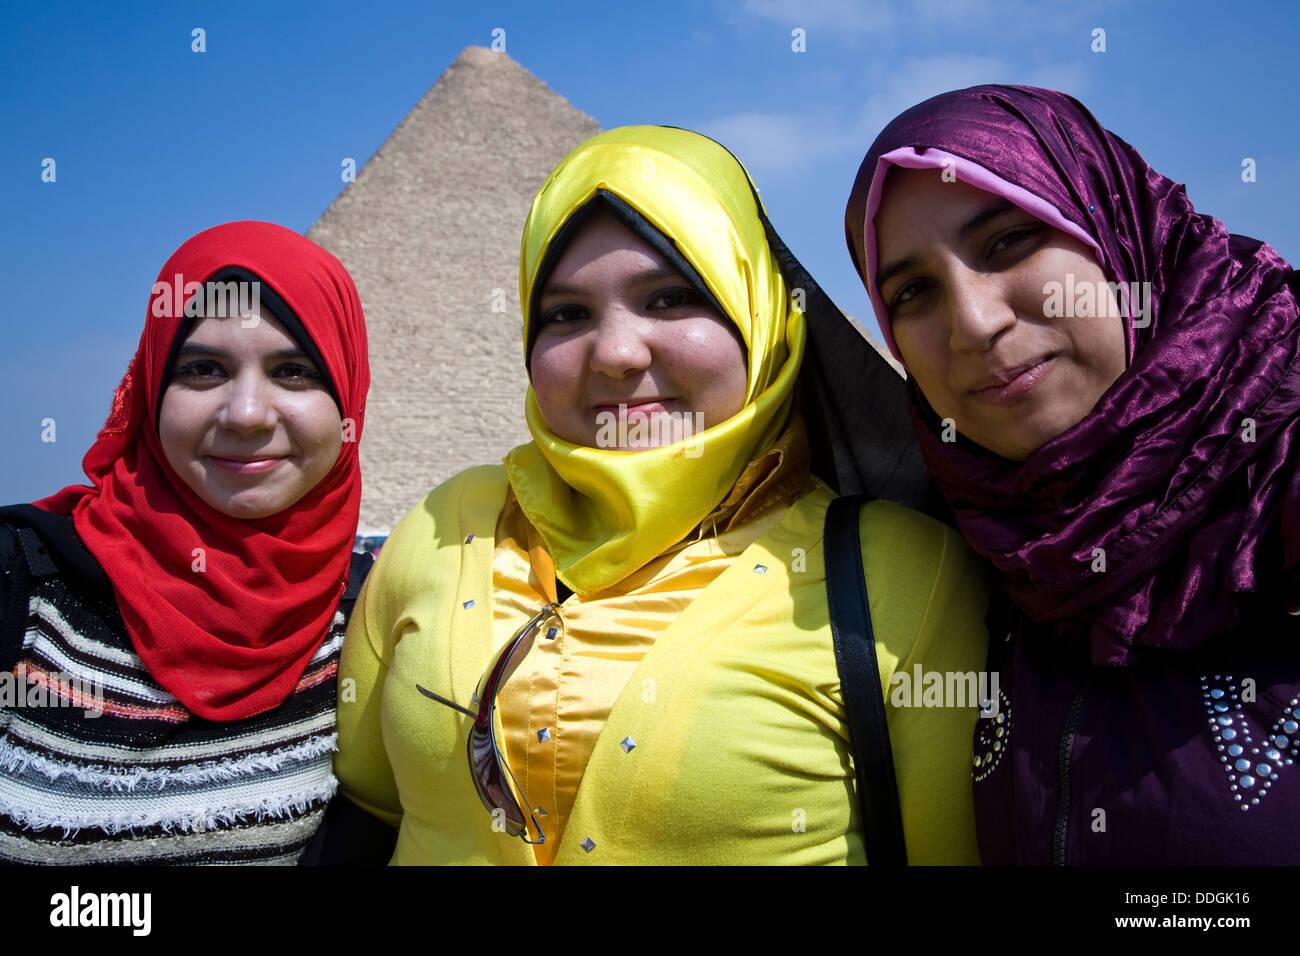 Moslem High School Girls Visiting The Pyramids Of Giza